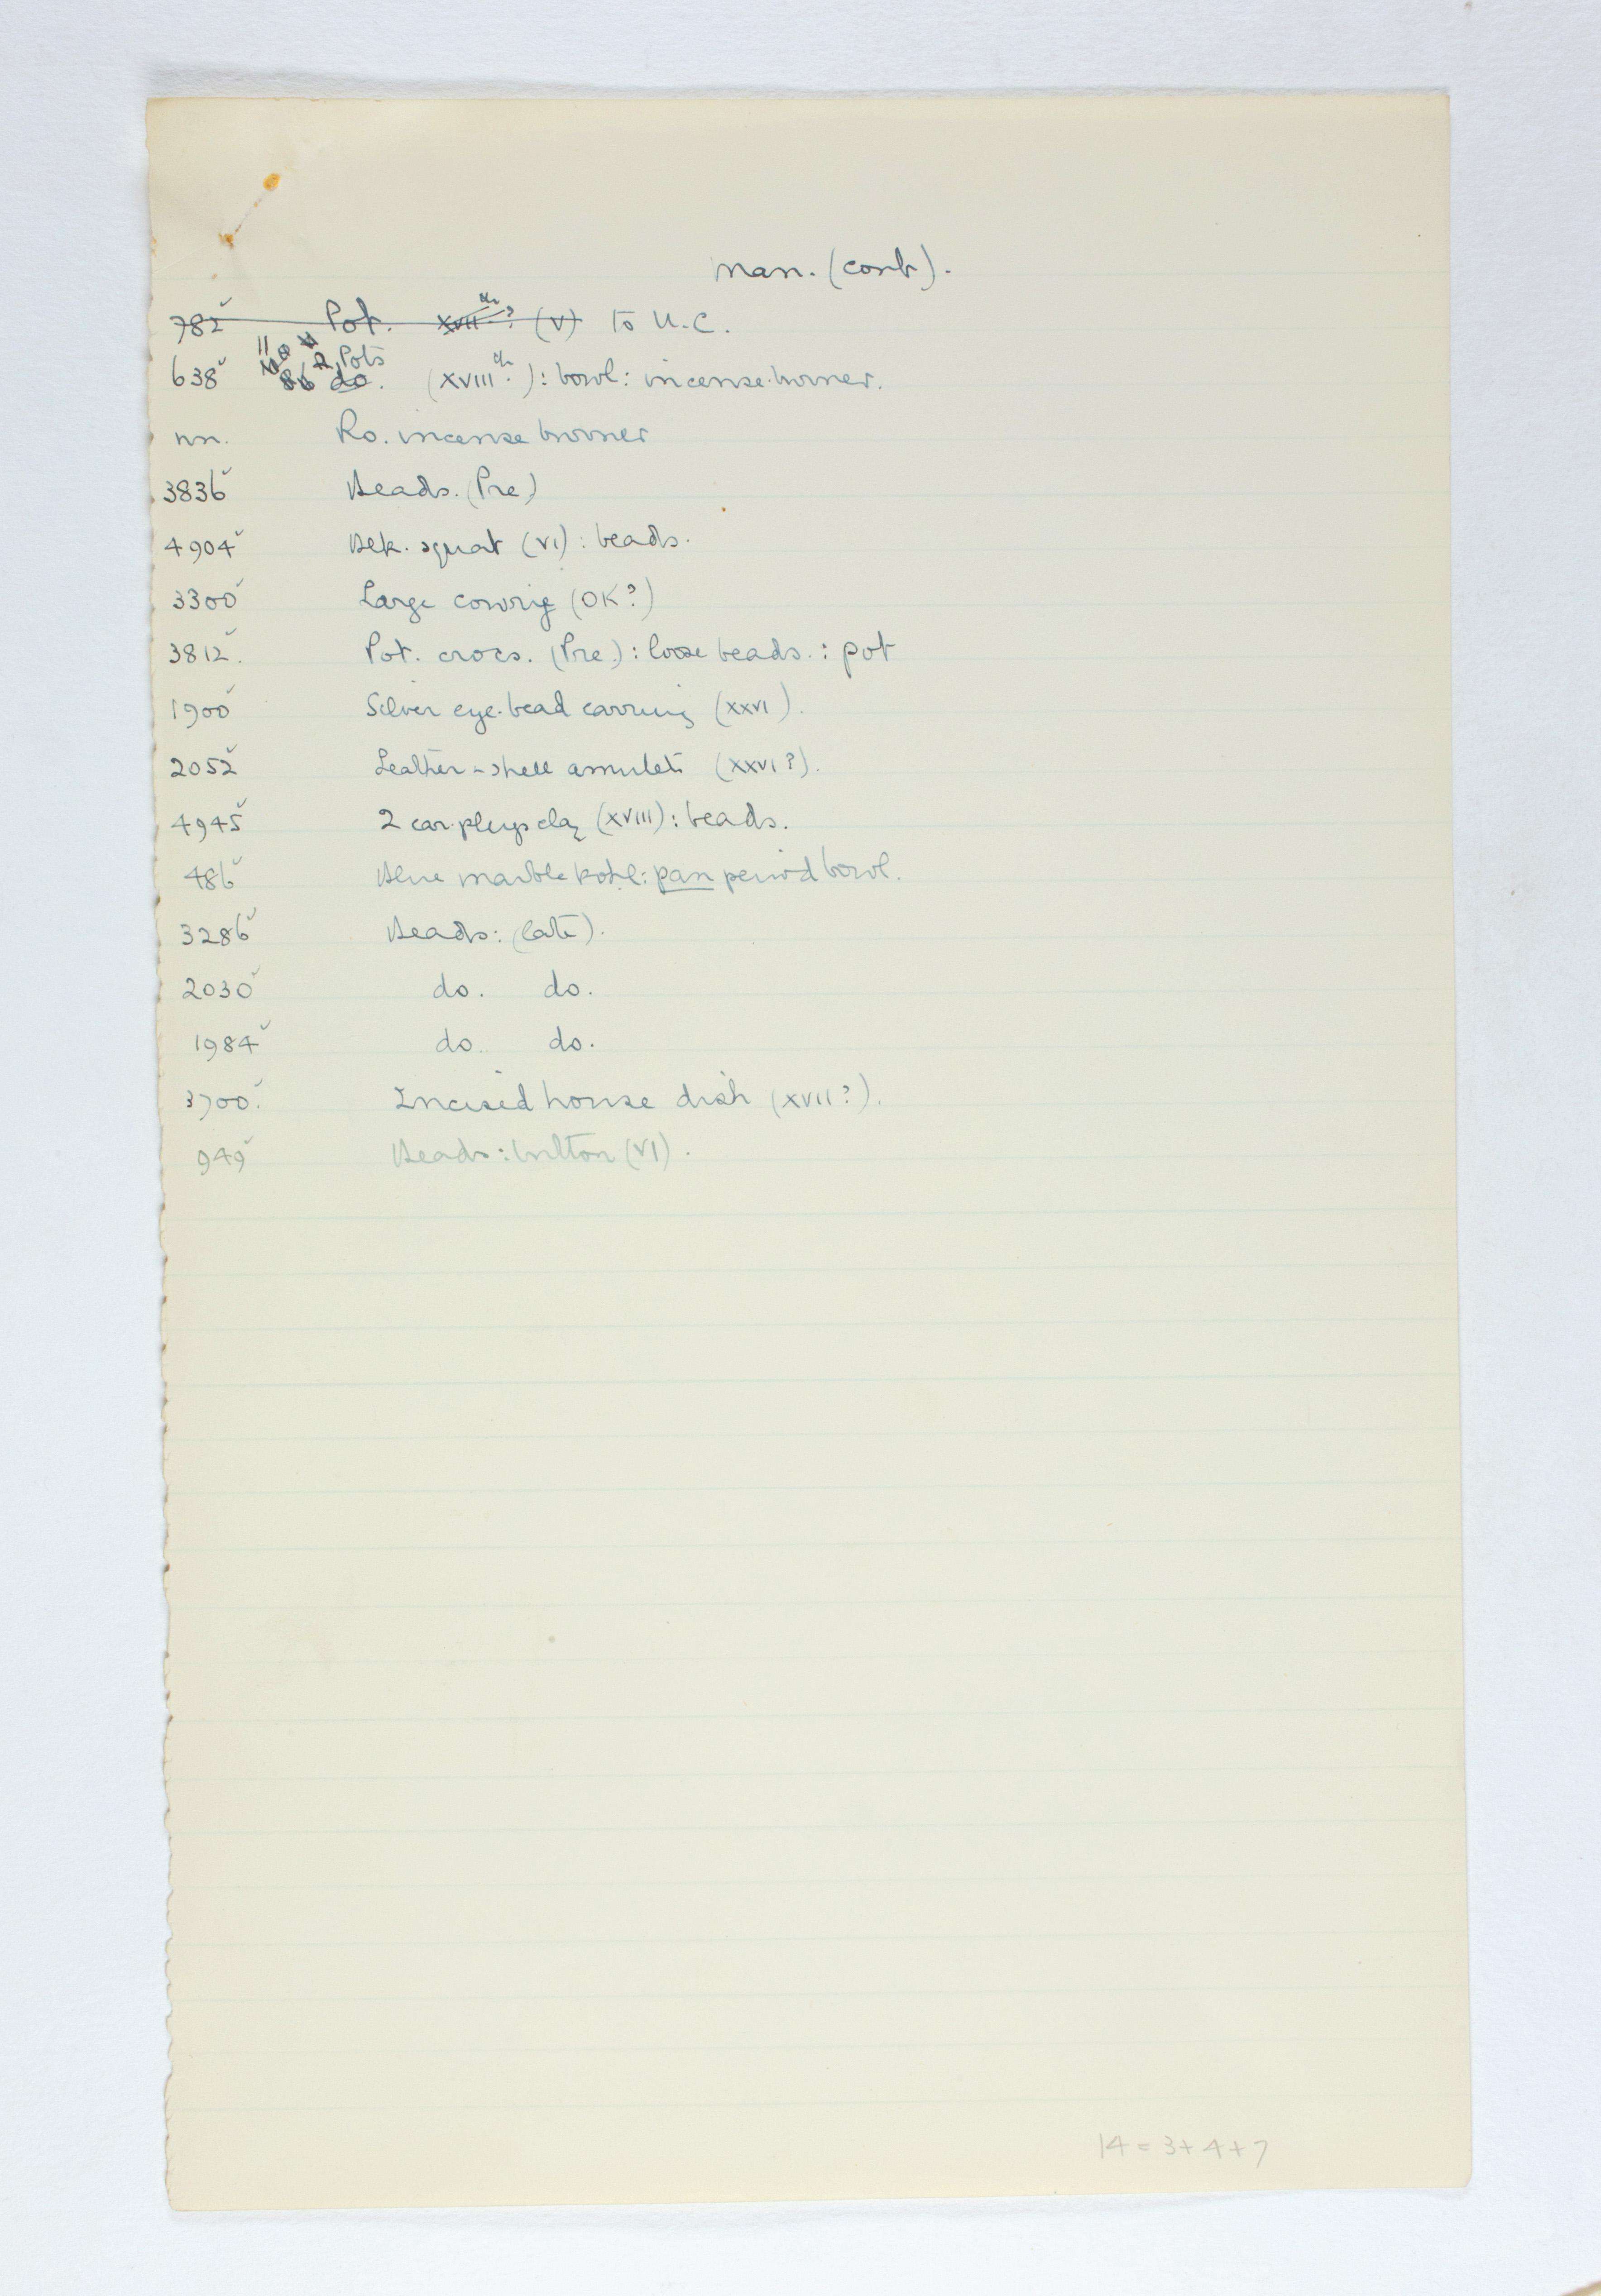 1923-24 Qau el-Kebir, Hemamieh Individual institution list PMA/WFP1/D/27/19.3